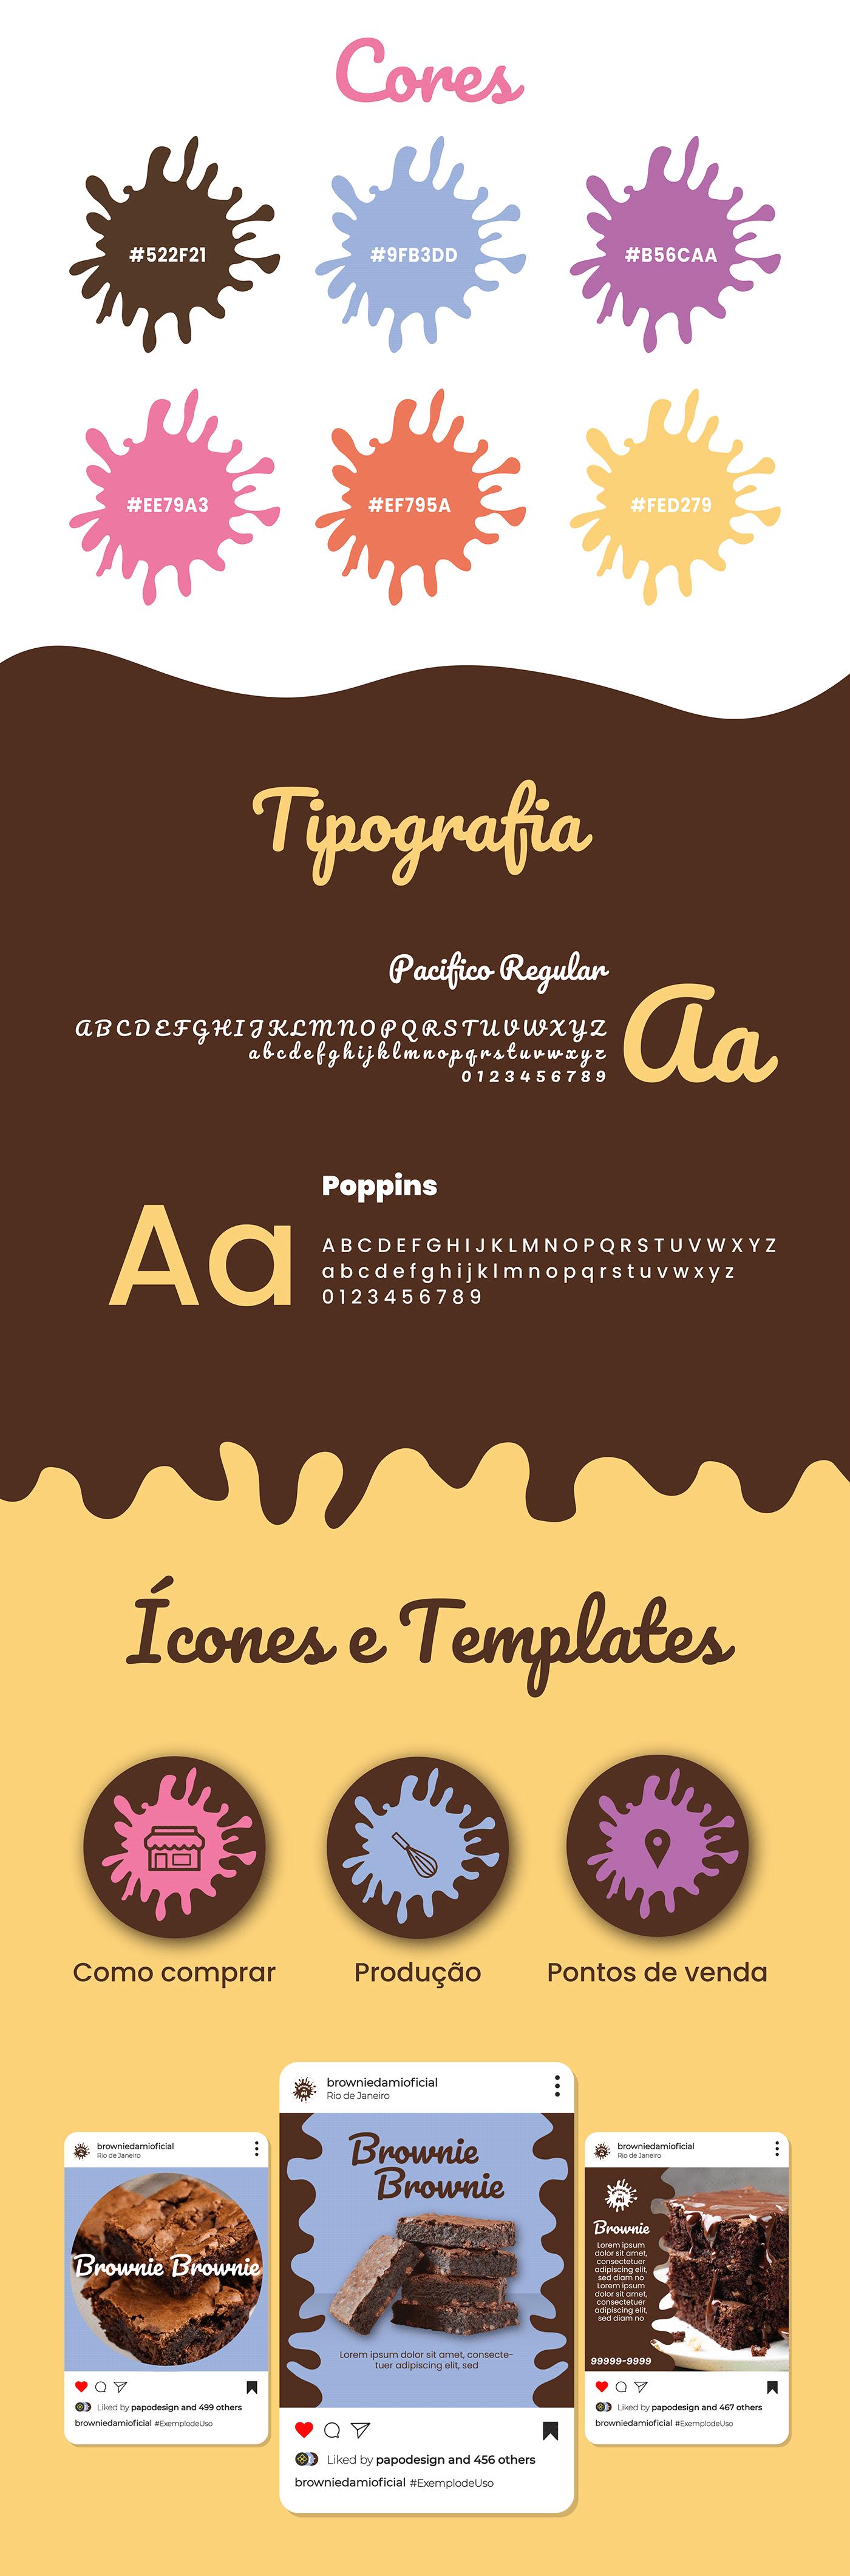 animação brownie chocolate design grafico identidade visual logo Mockup Redes Sociais rótulo